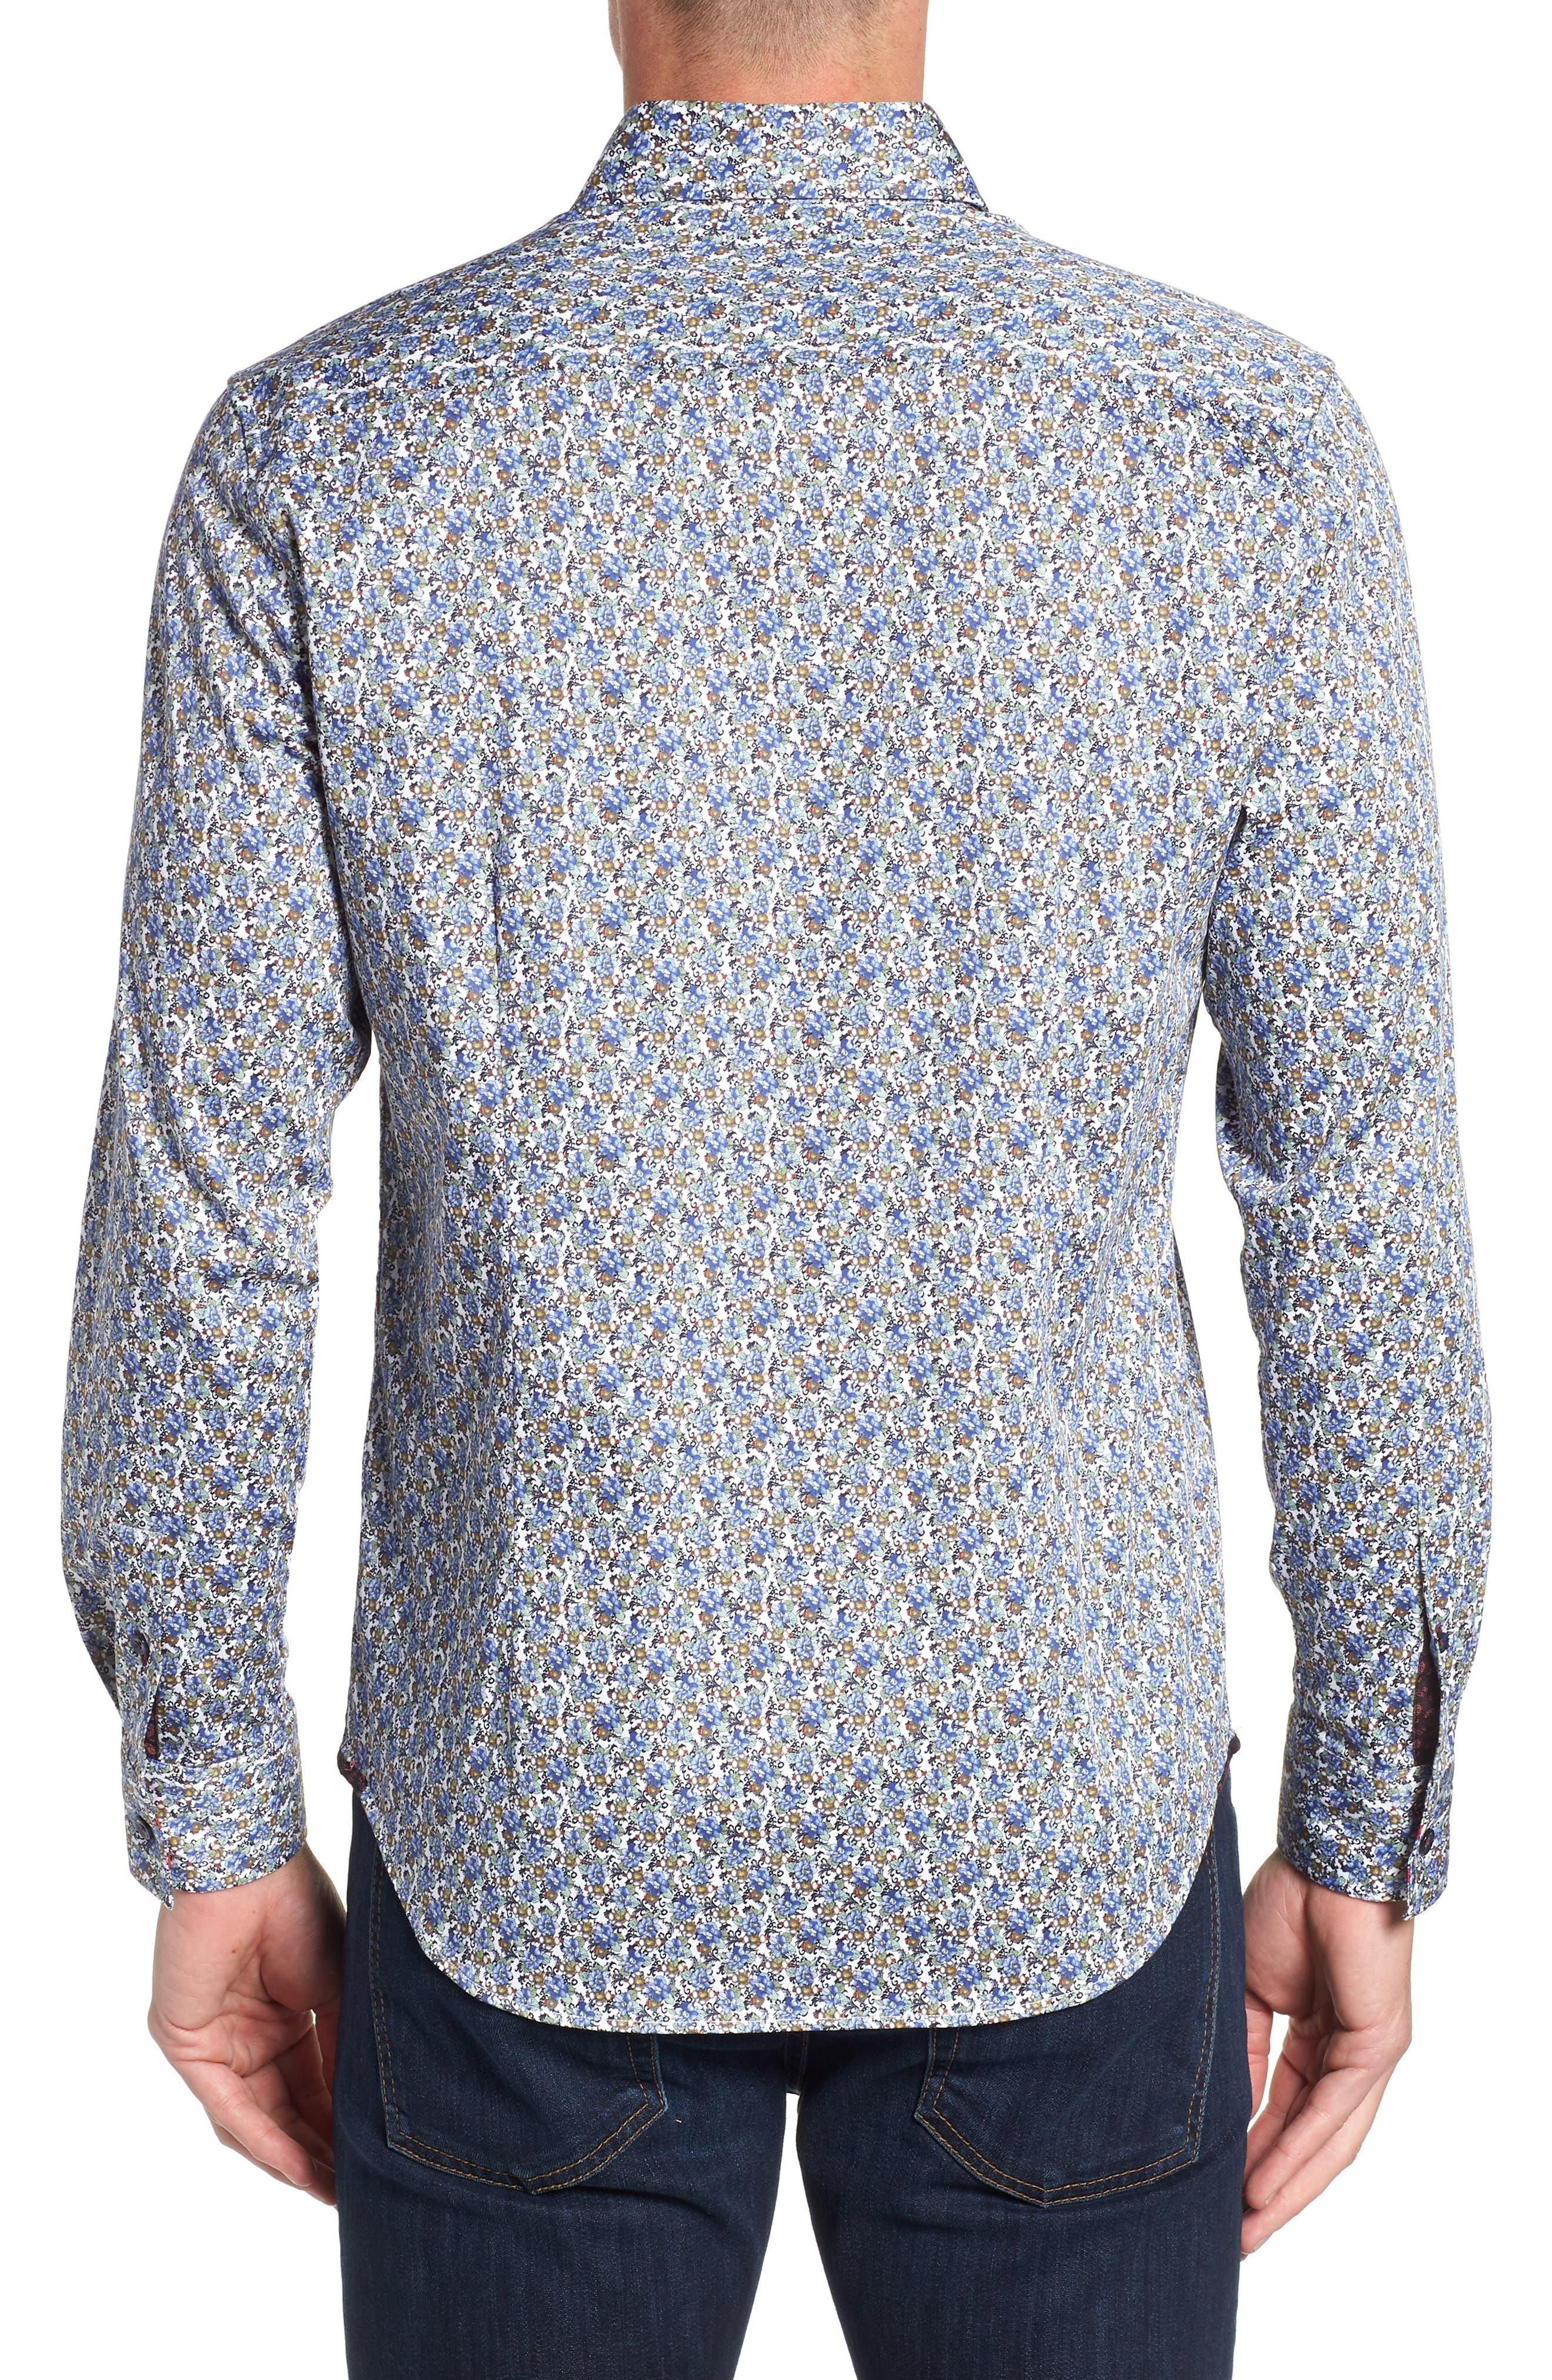 Richardson Tailored Fit Print Sport Shirt,                             Alternate thumbnail 3, color,                             400